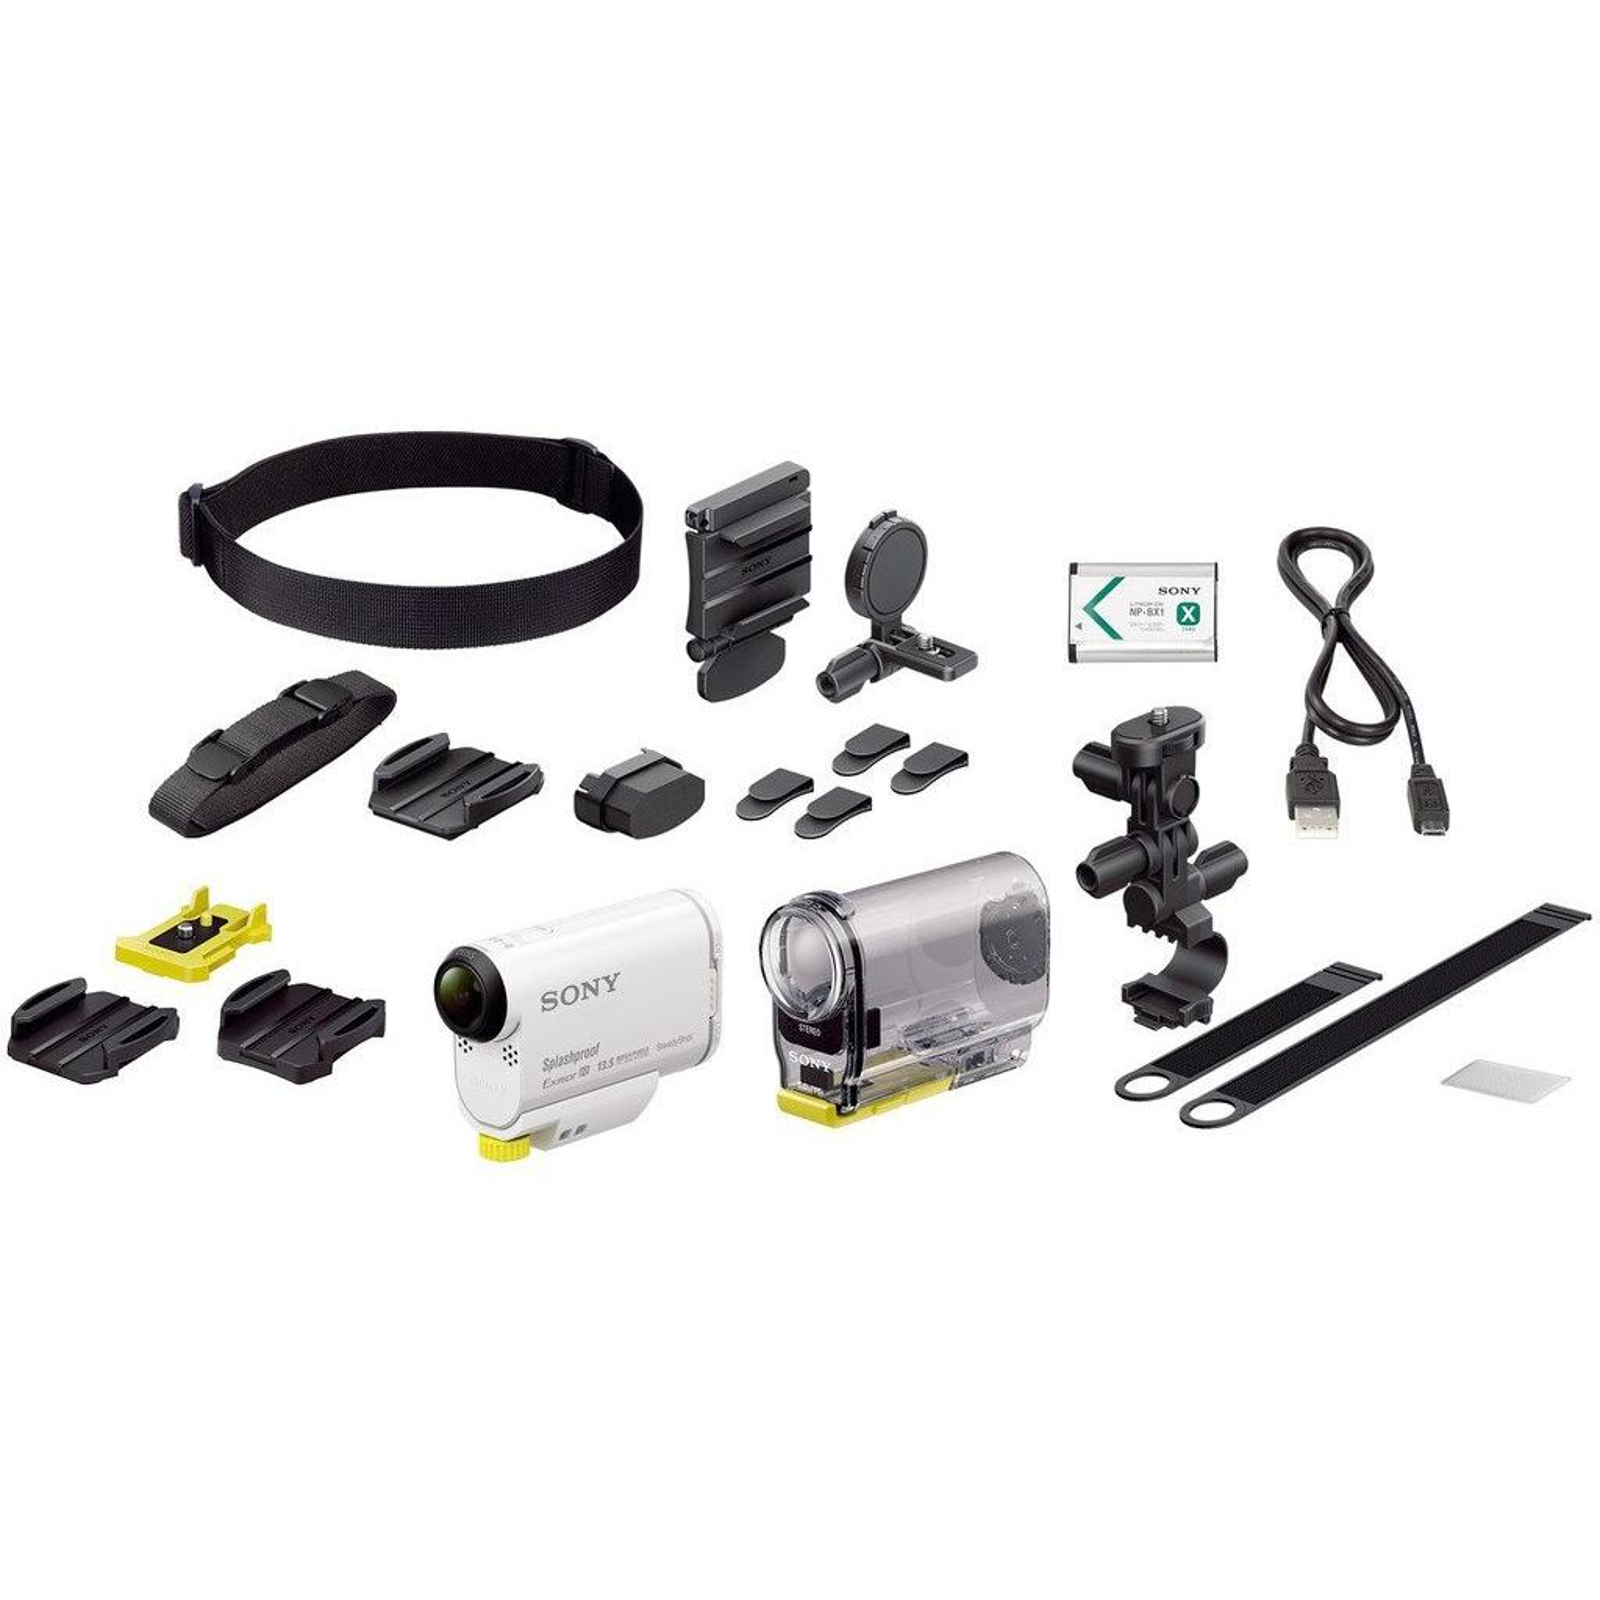 Экшн-камера SONY HDR-AS100V w/bicycle mount (HDRAS100VB.CEN) изображение 9